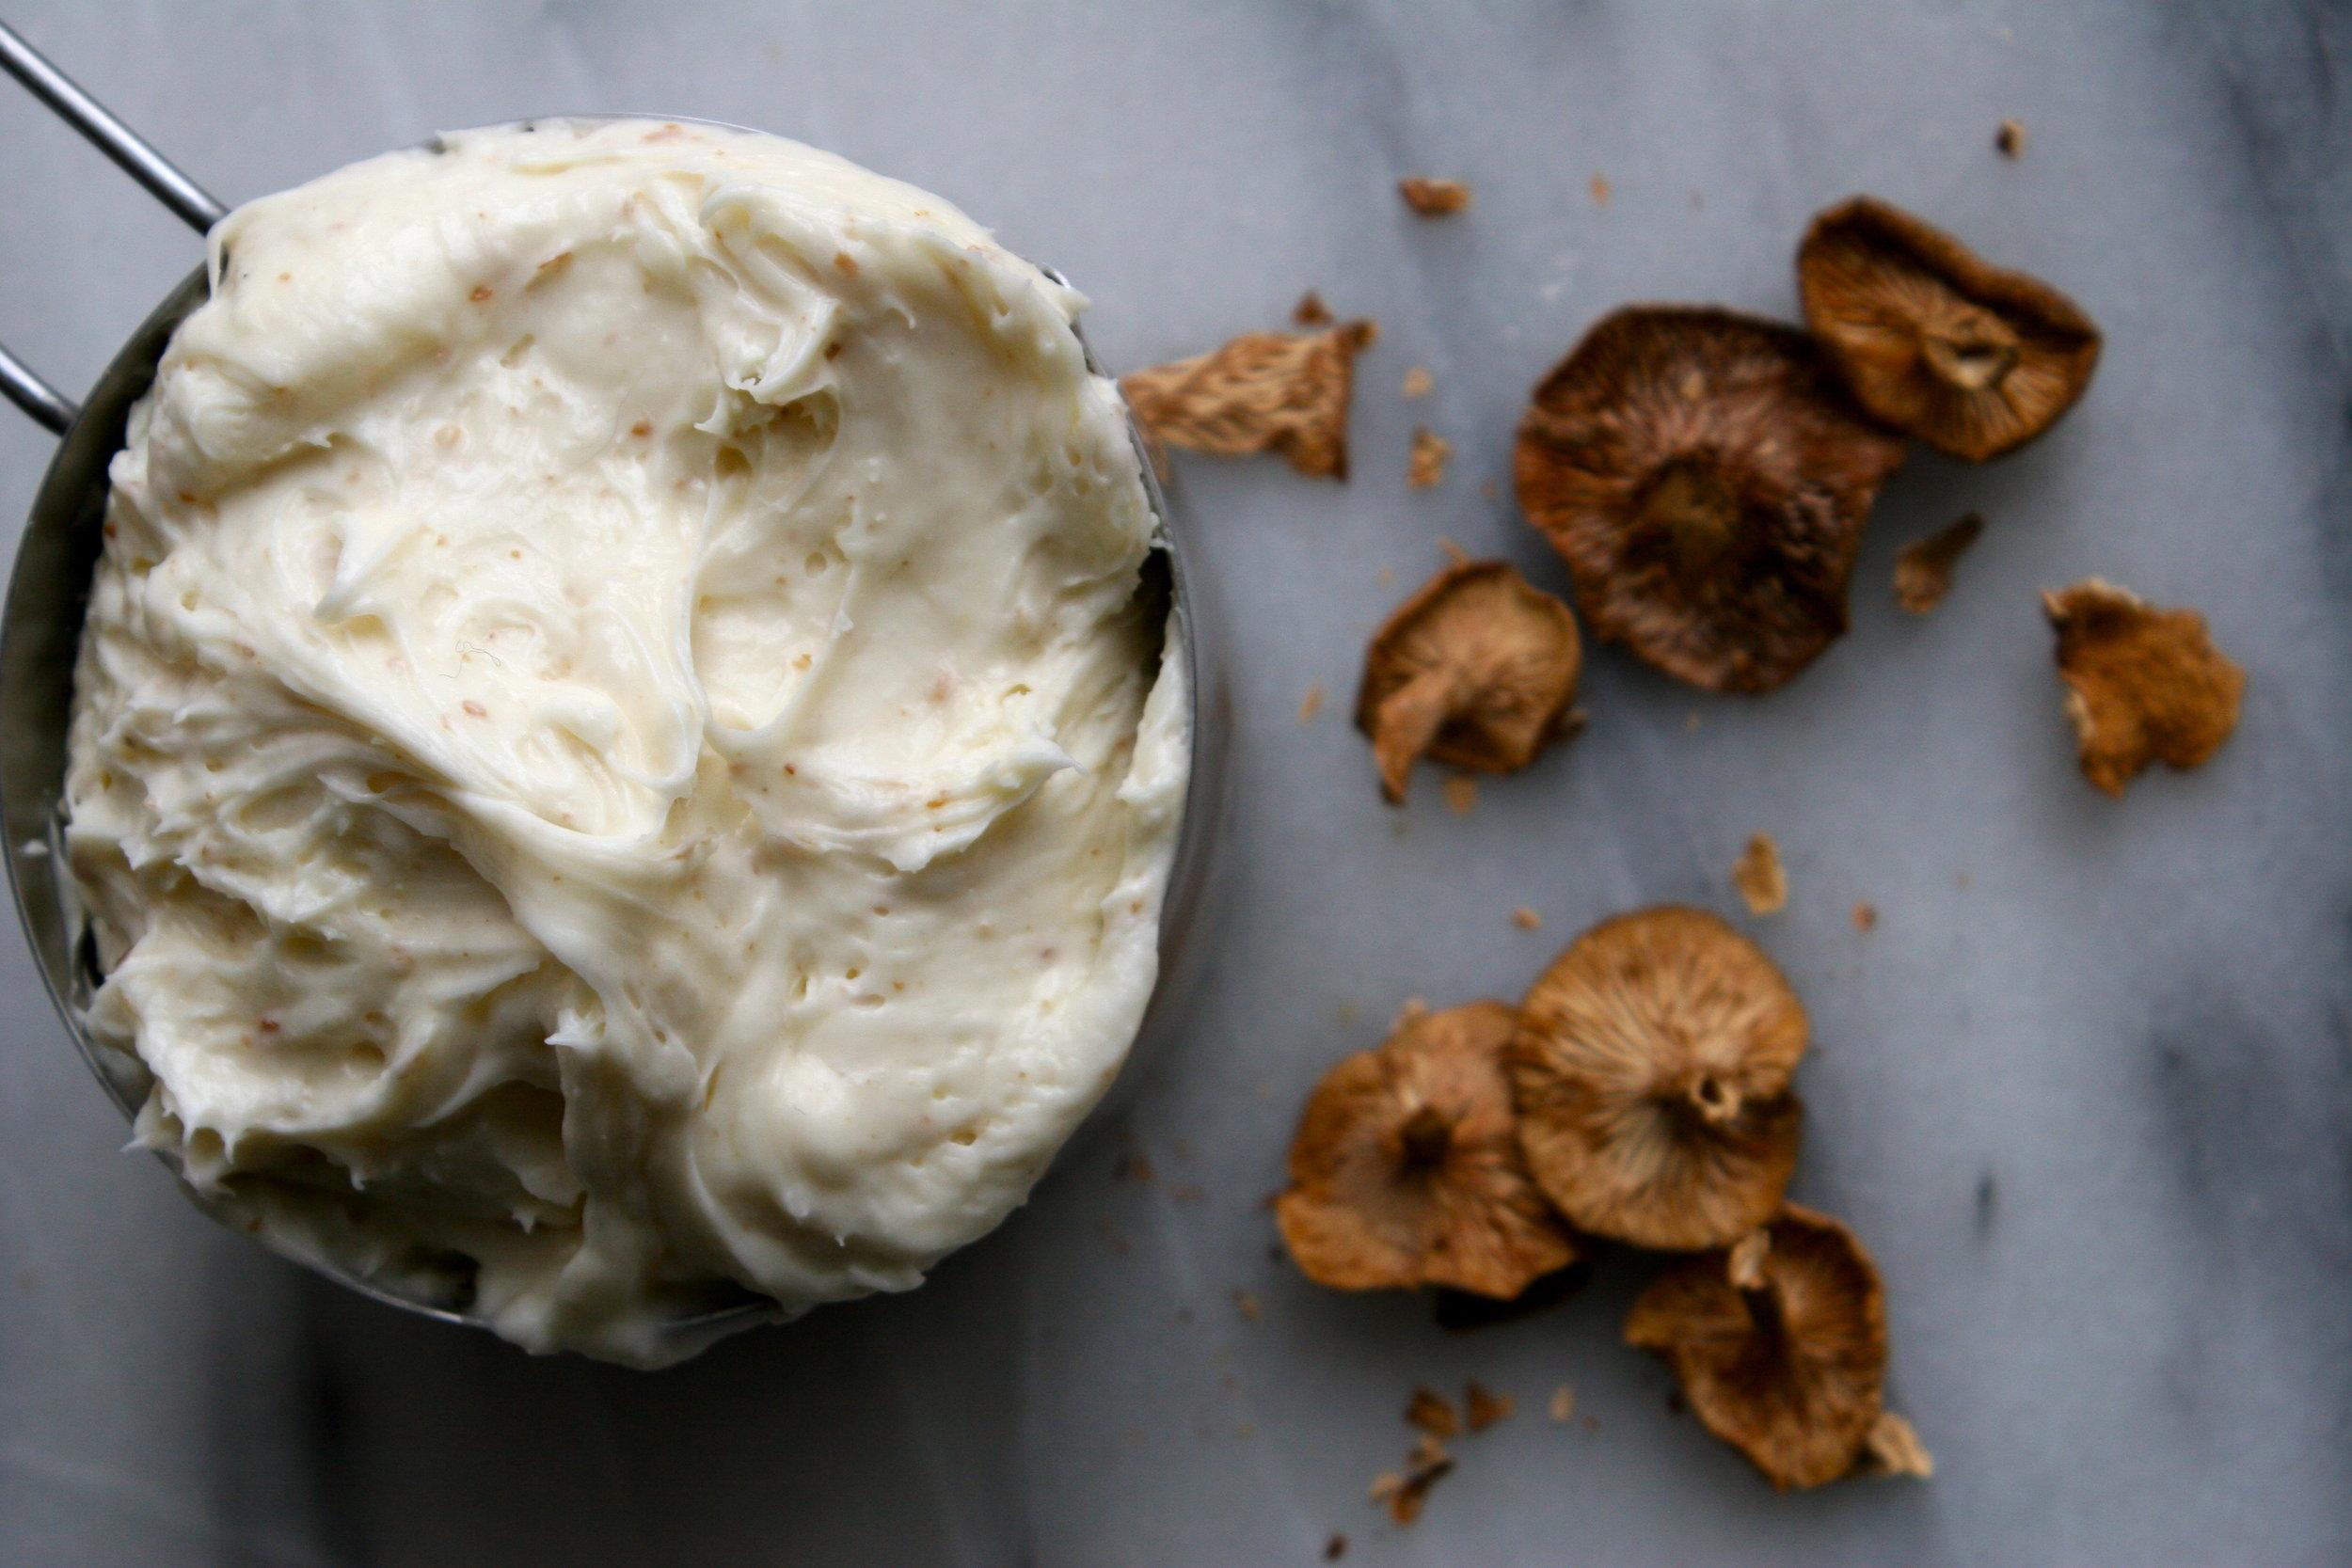 candy cap mushroom cream cheese frosting recipe